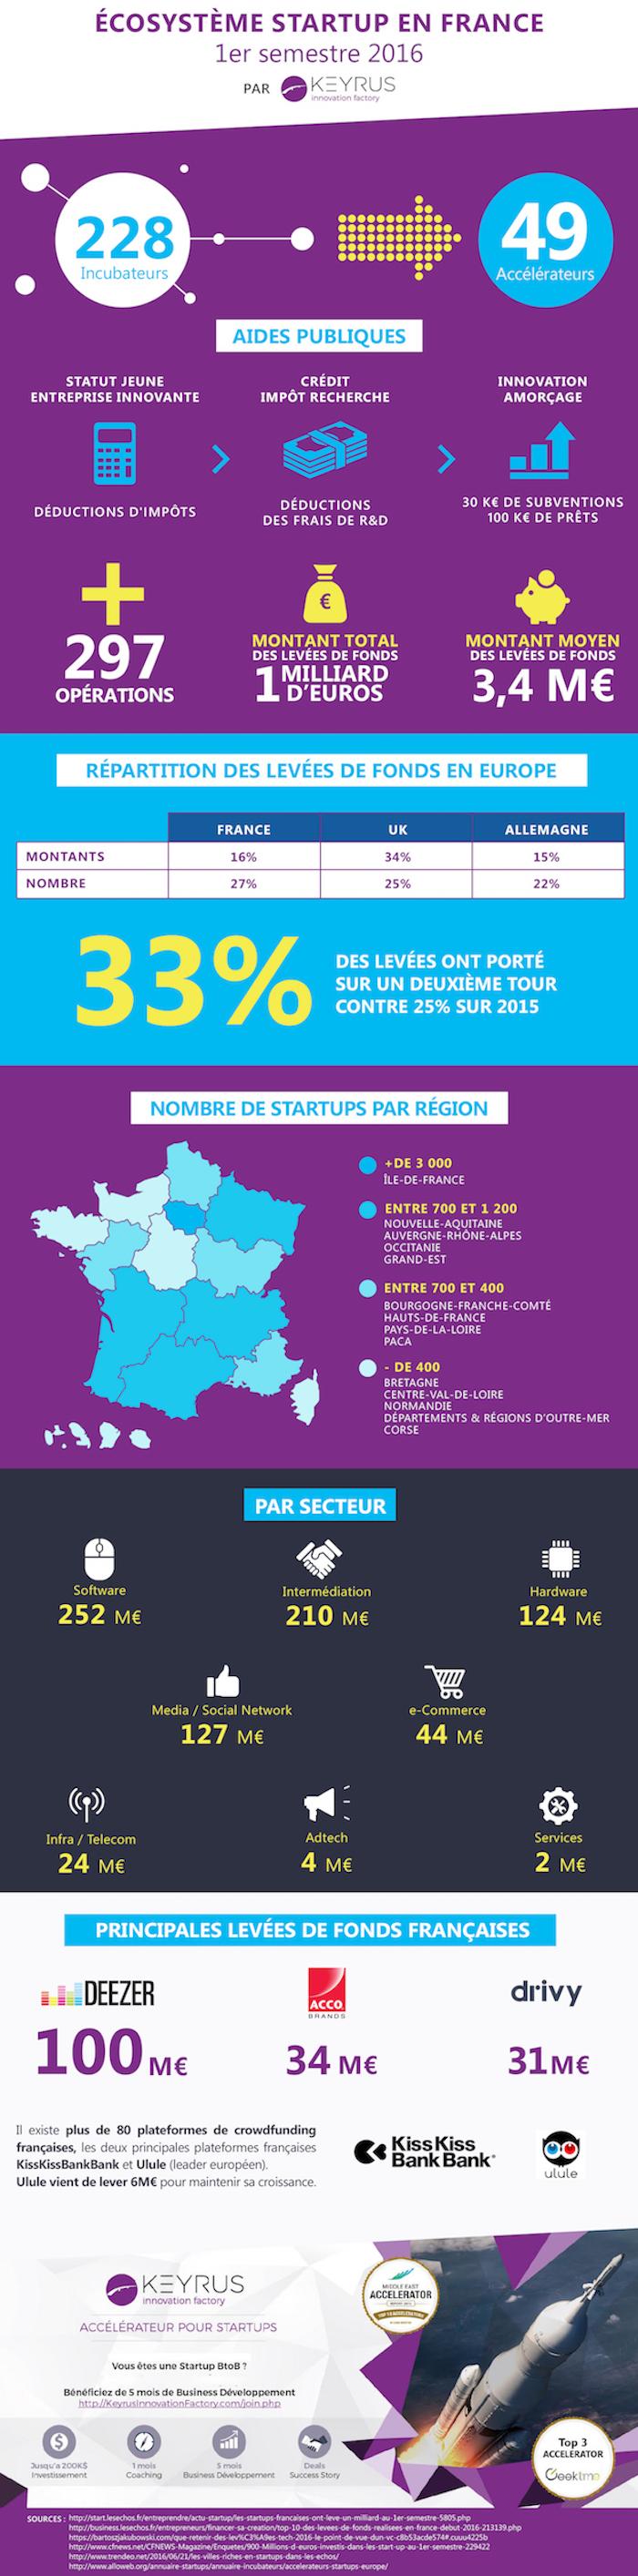 ecosysteme-startup-en-france-1S-2016